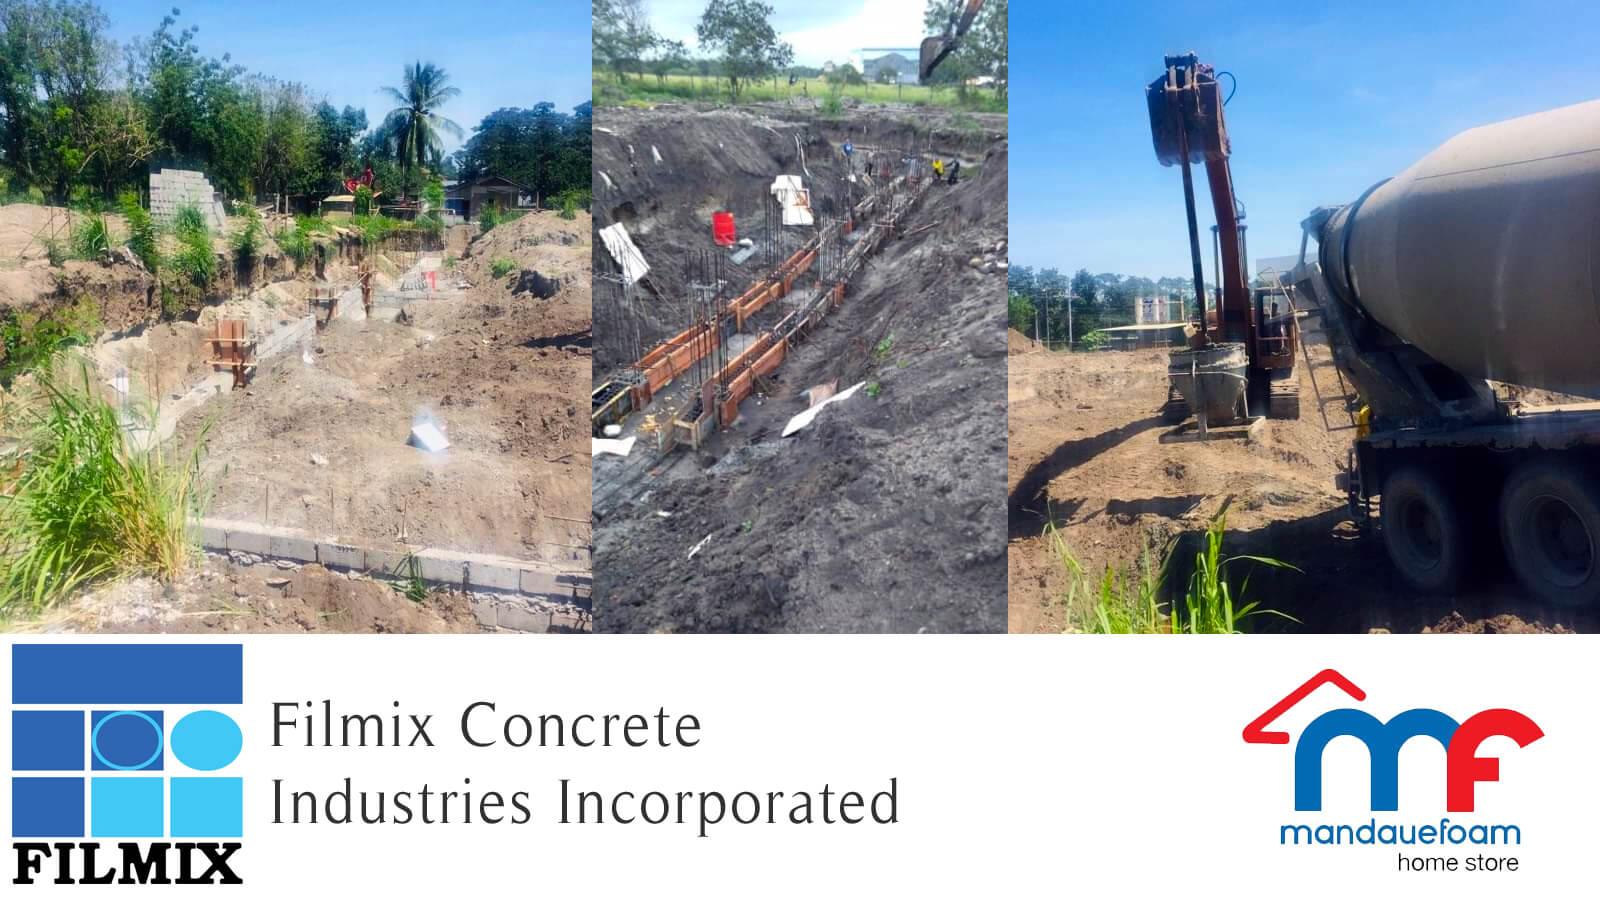 Ready-mix concrete supplier Filmix pouring for Mandaue Foam Gensan